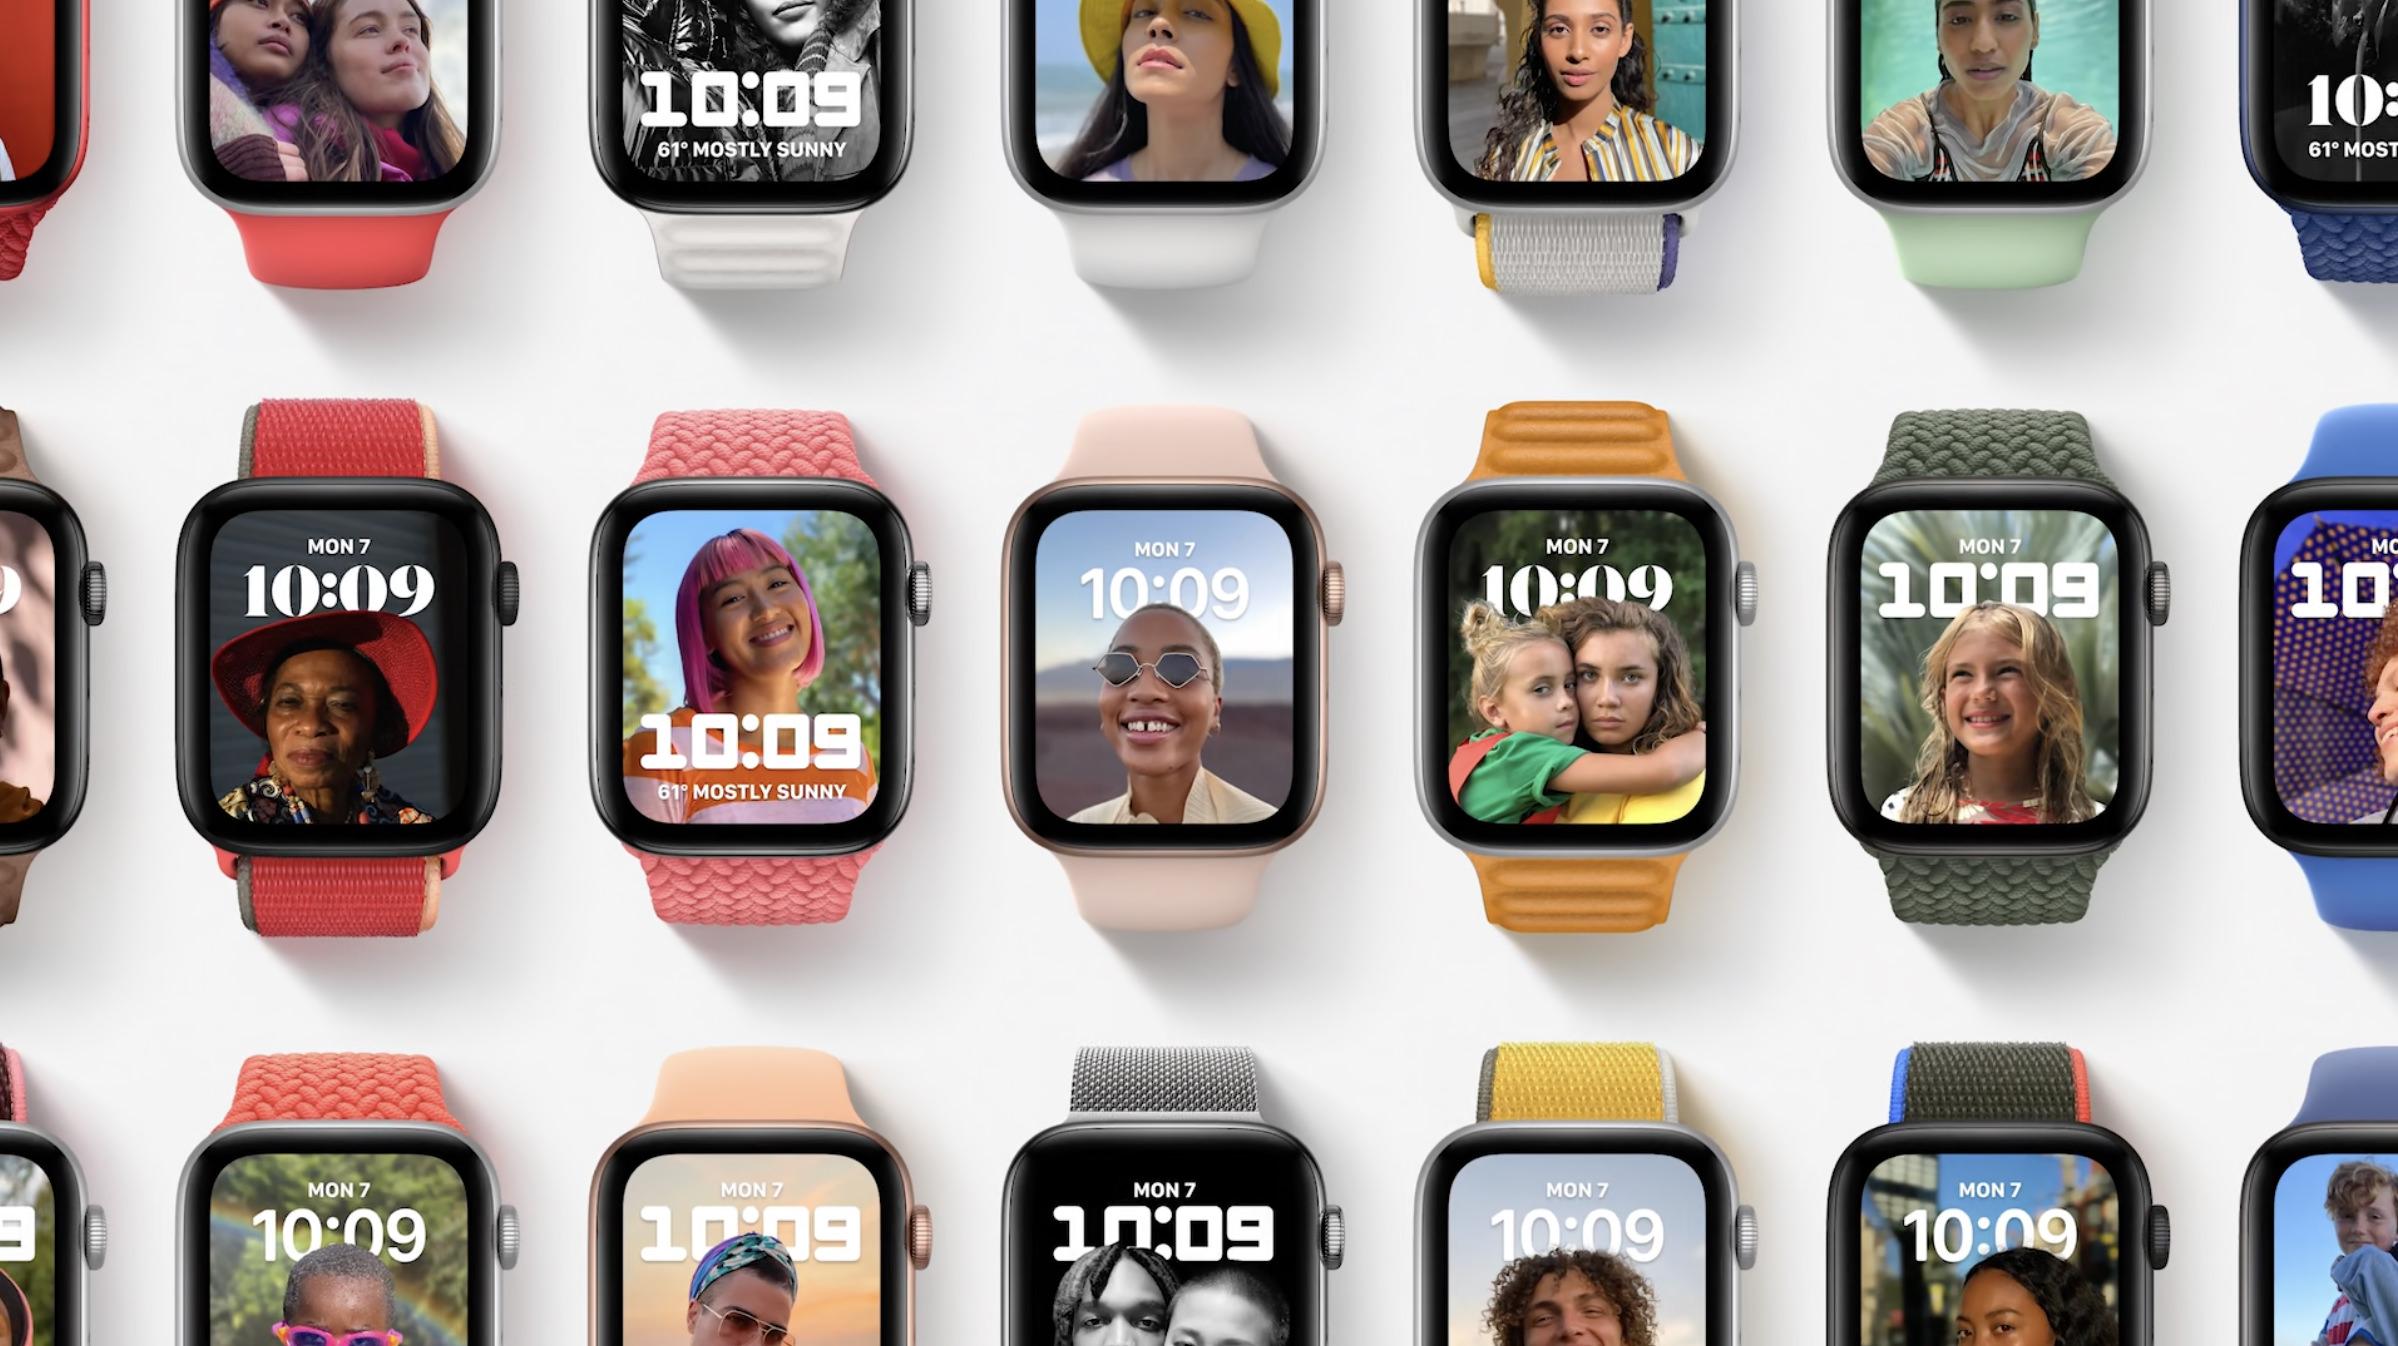 WWDC21 Keynote 4289